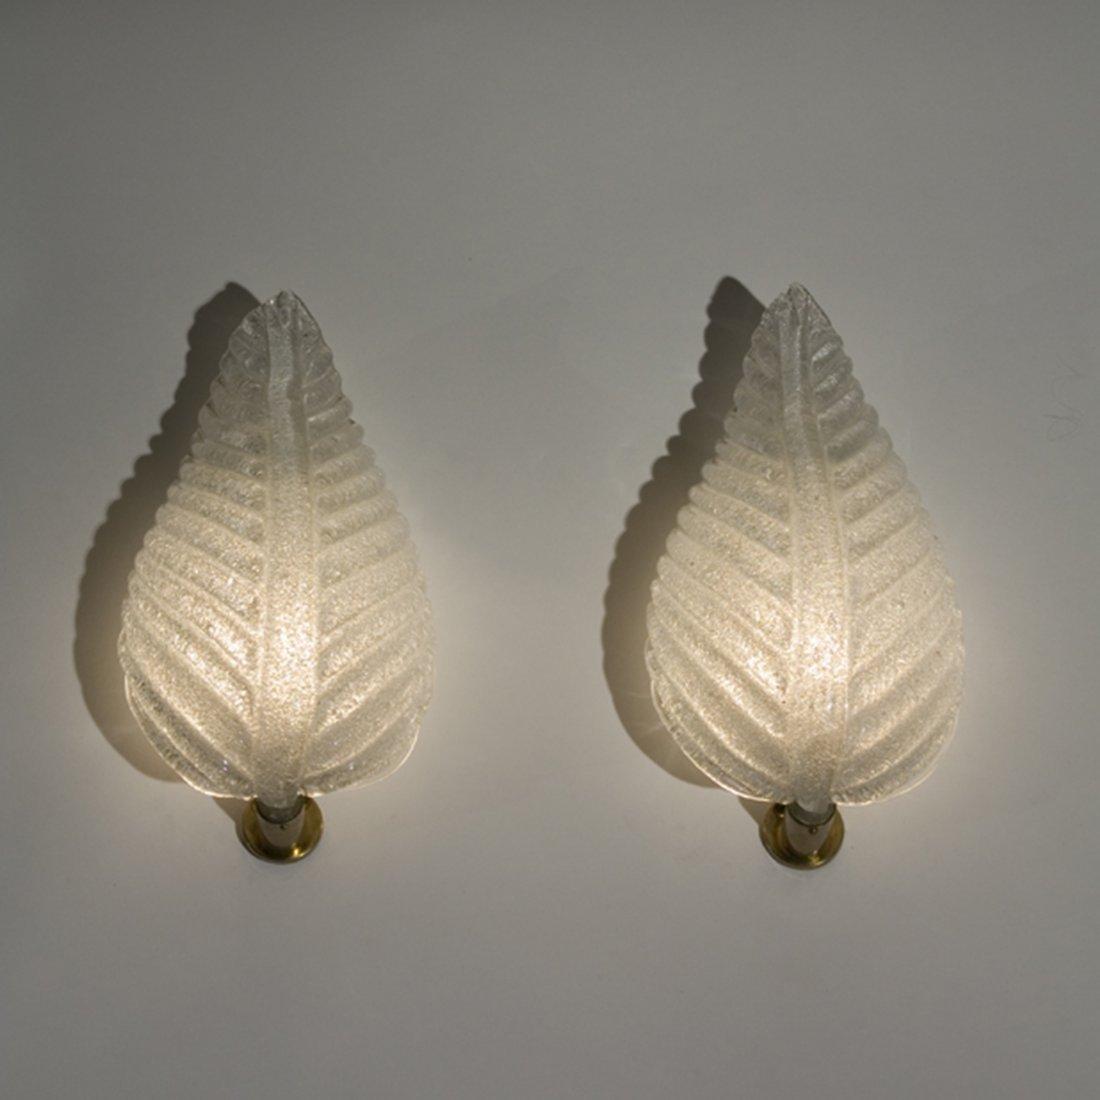 Rugiodoso Sconces by Barovier, Pair